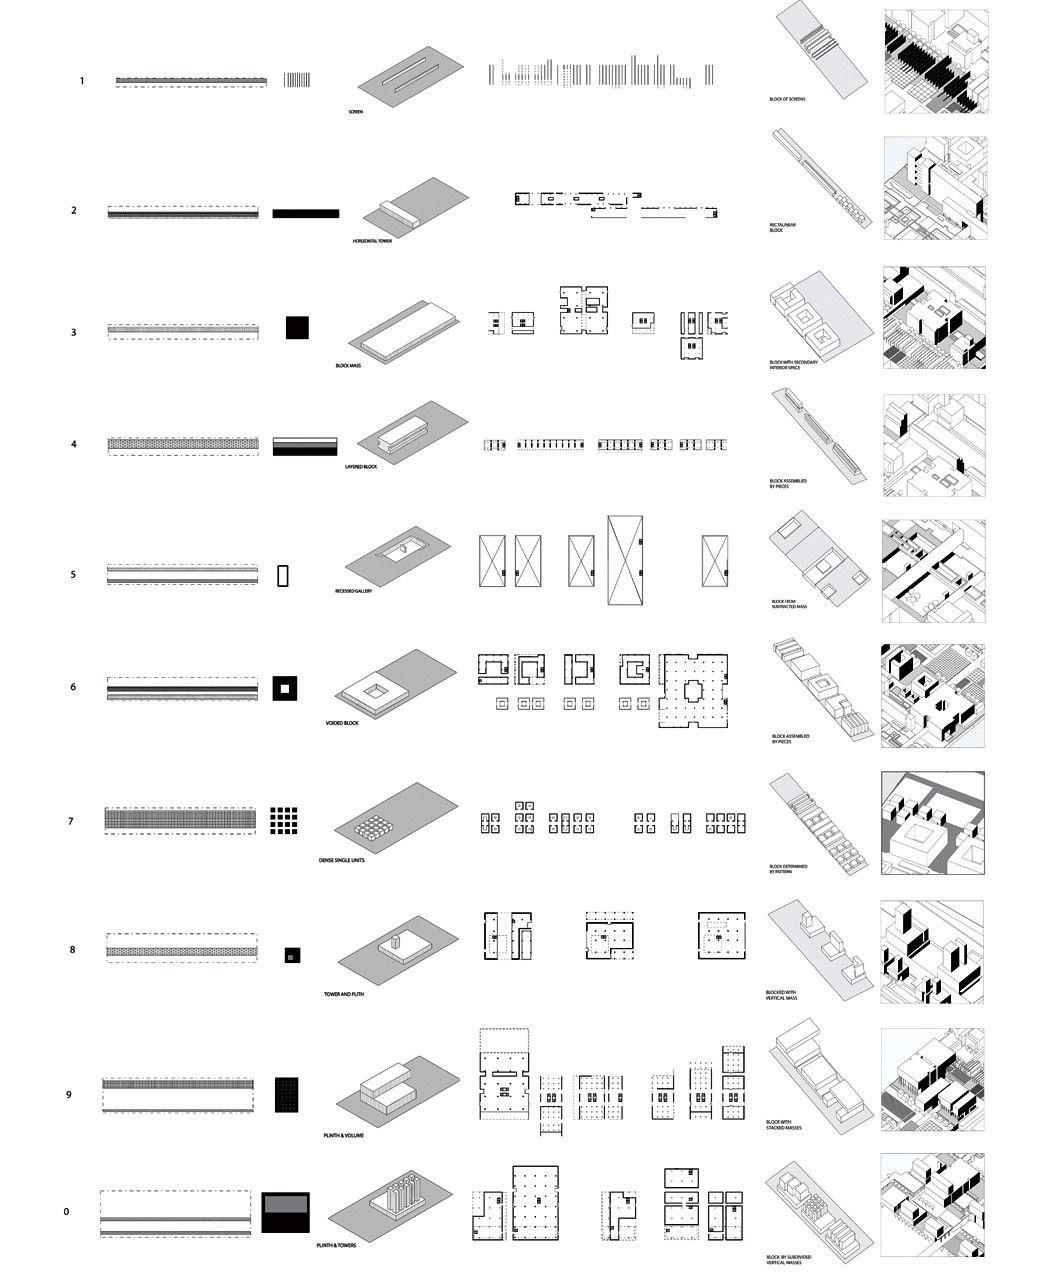 ungers 2 building typology diagrams [ 1056 x 1275 Pixel ]